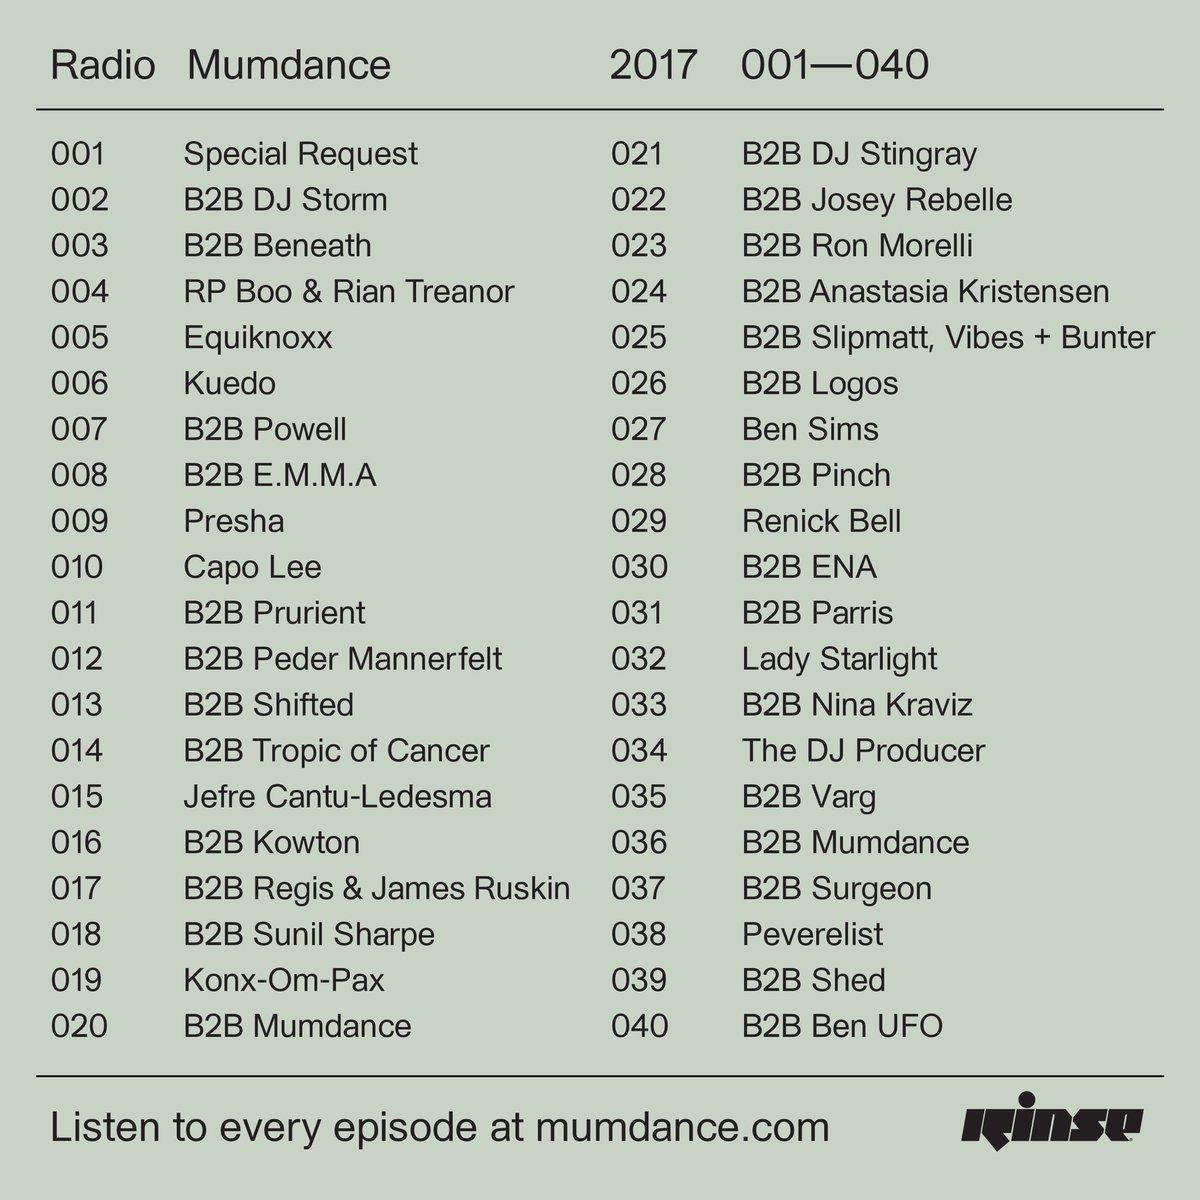 Top 40 DJ mixes of 2017 in no particular order:  🏆🏆🏆🏆🏆🏆🏆🏆  Congratulations Mumdance!